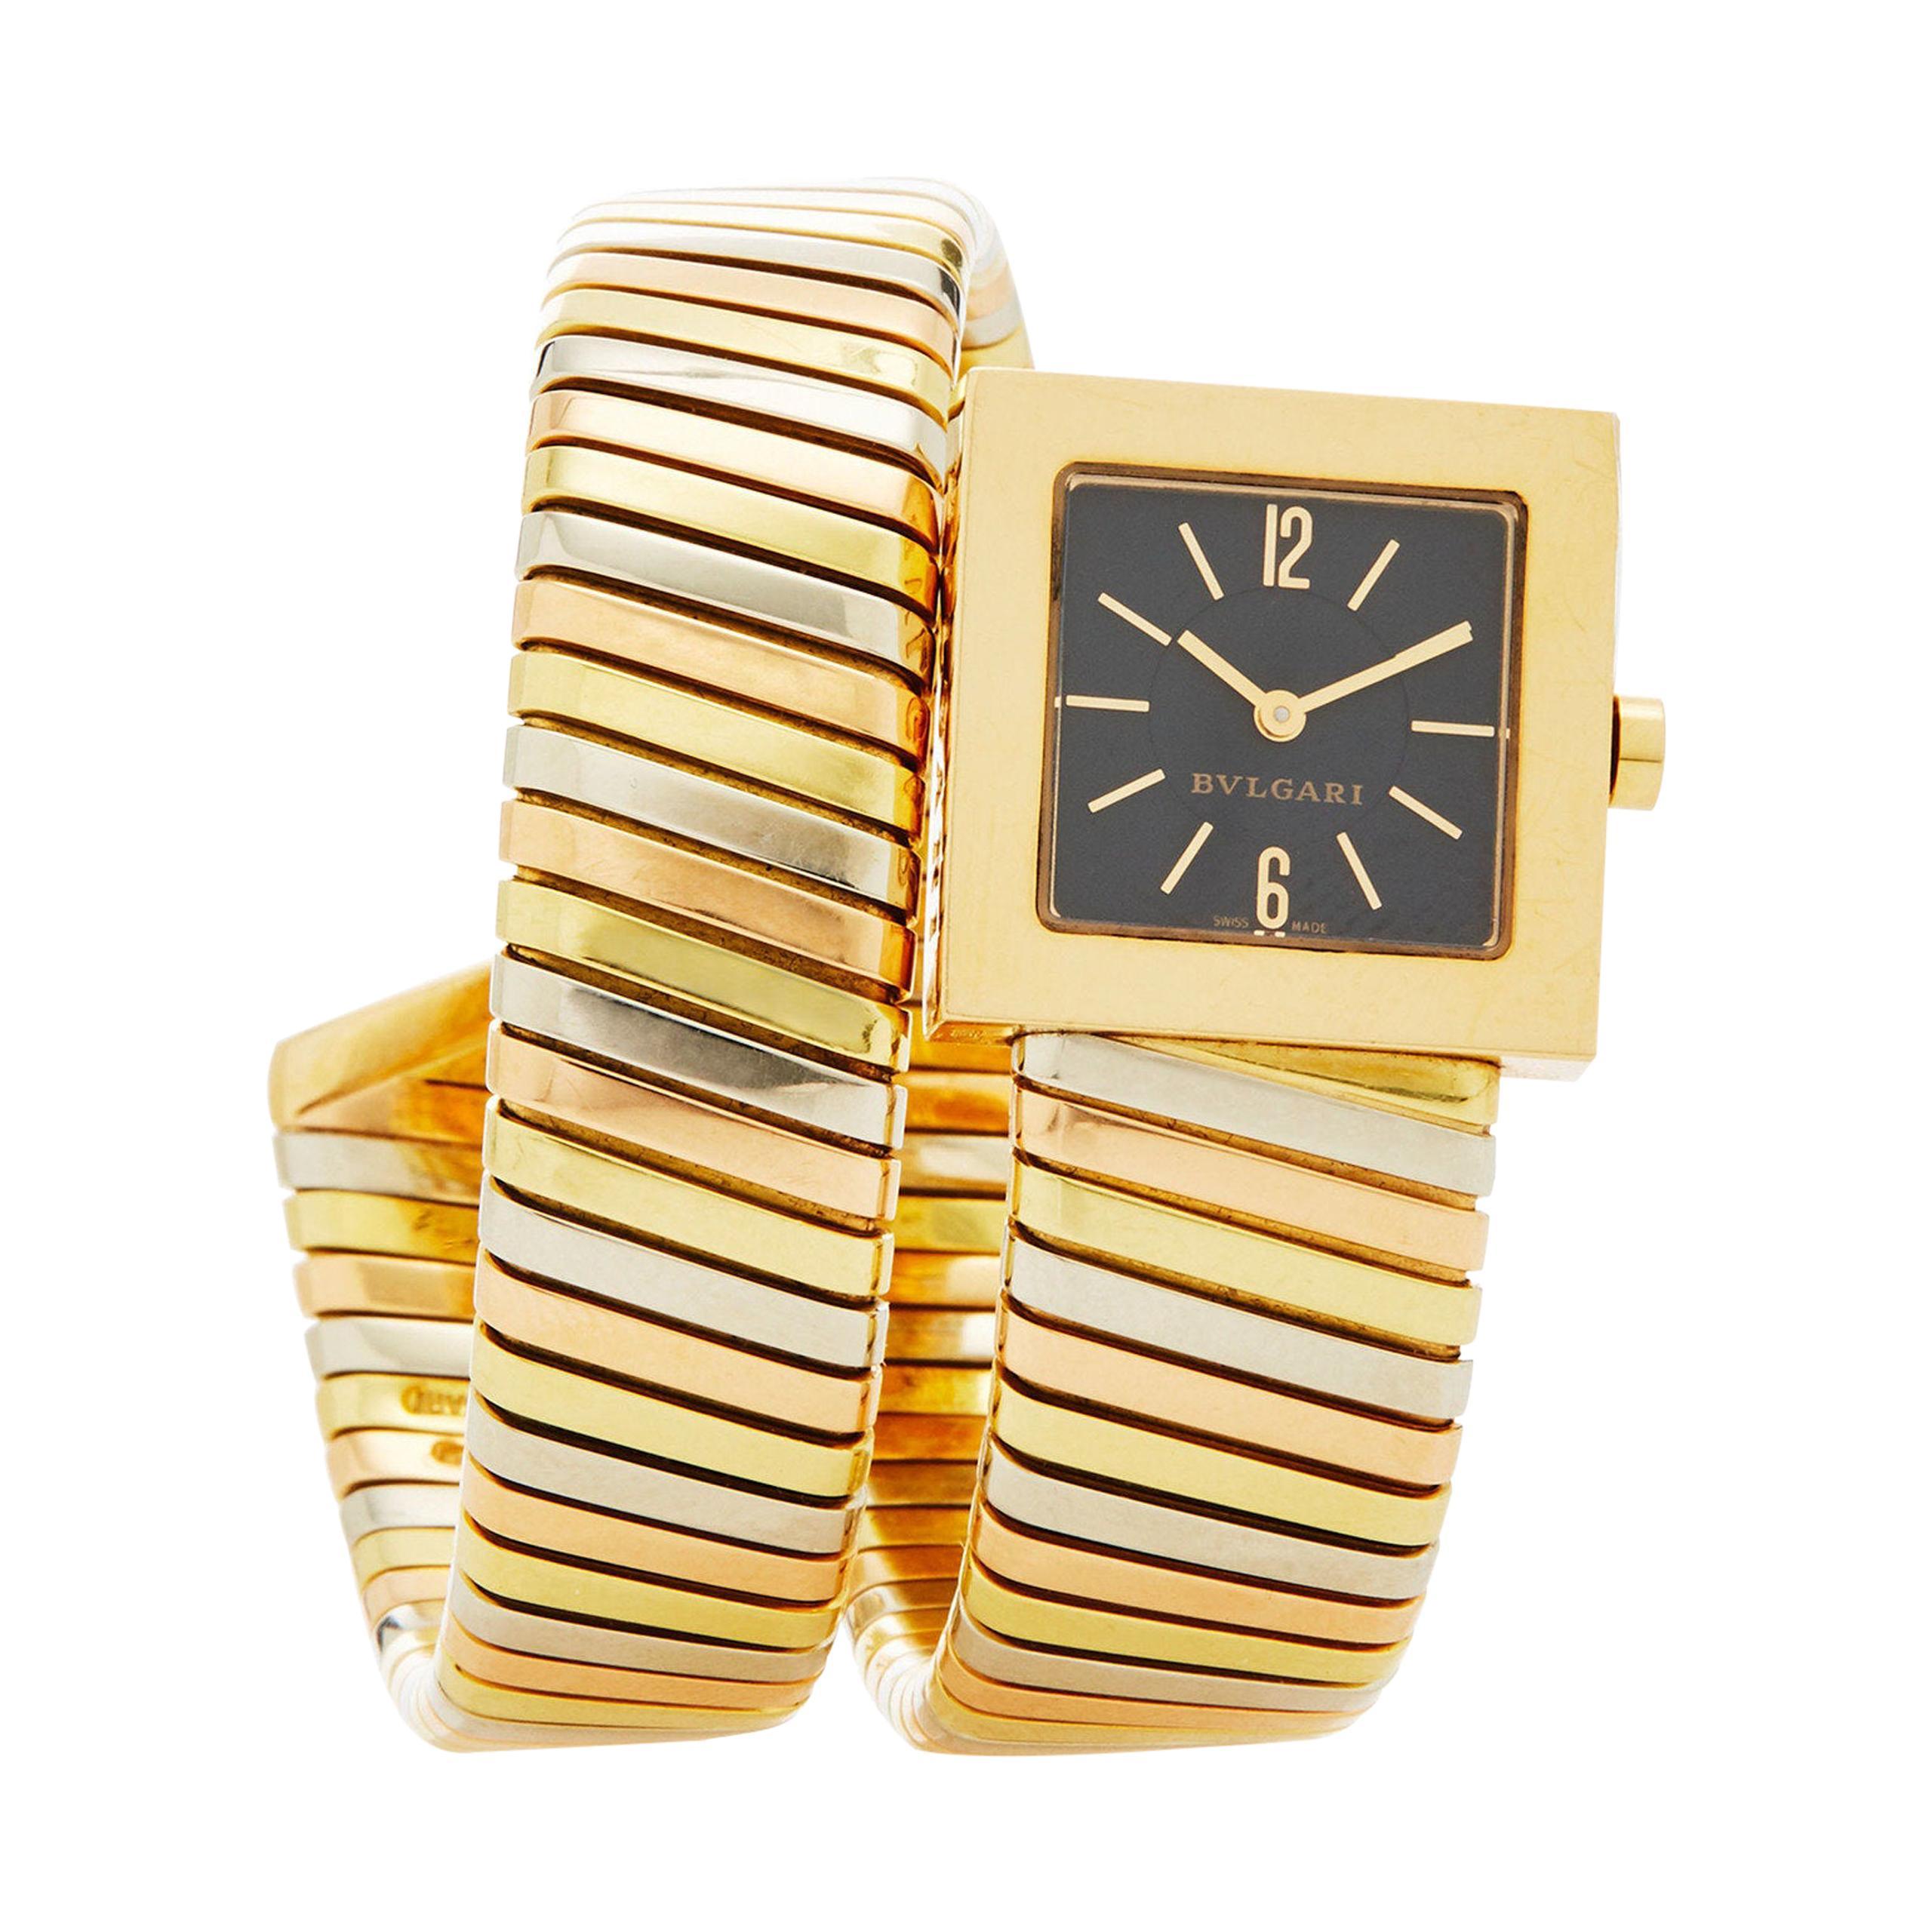 Bulgari Tubogas 18 Karat Tricolor Gold Watch